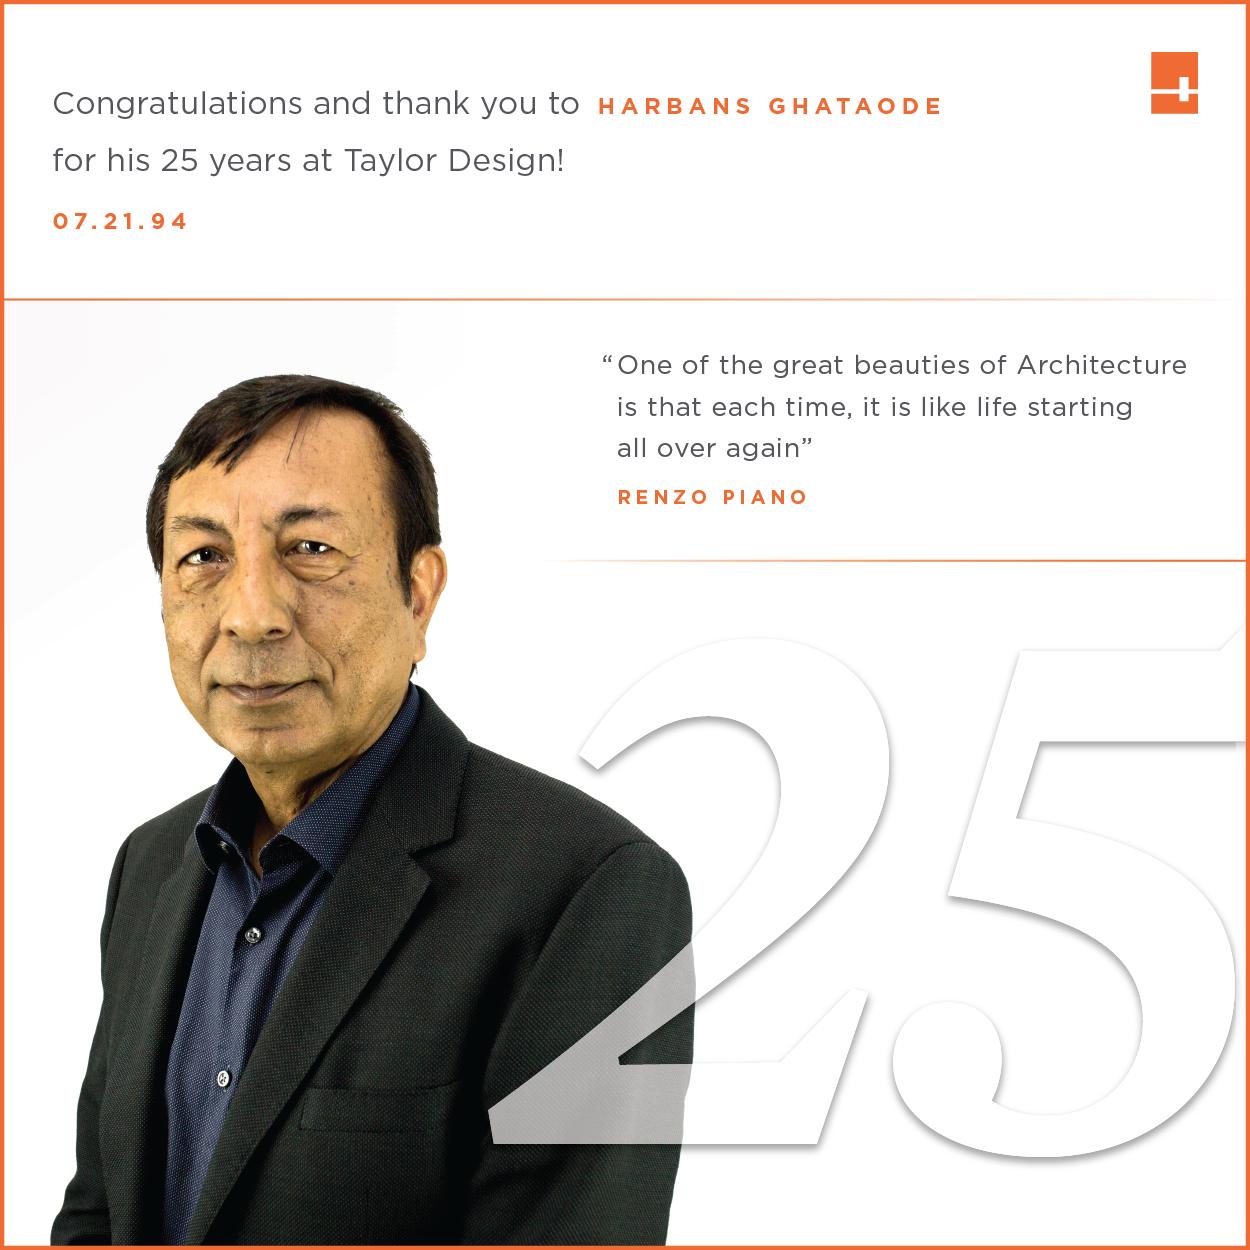 Harbans Ghataode - 25th Anniversary